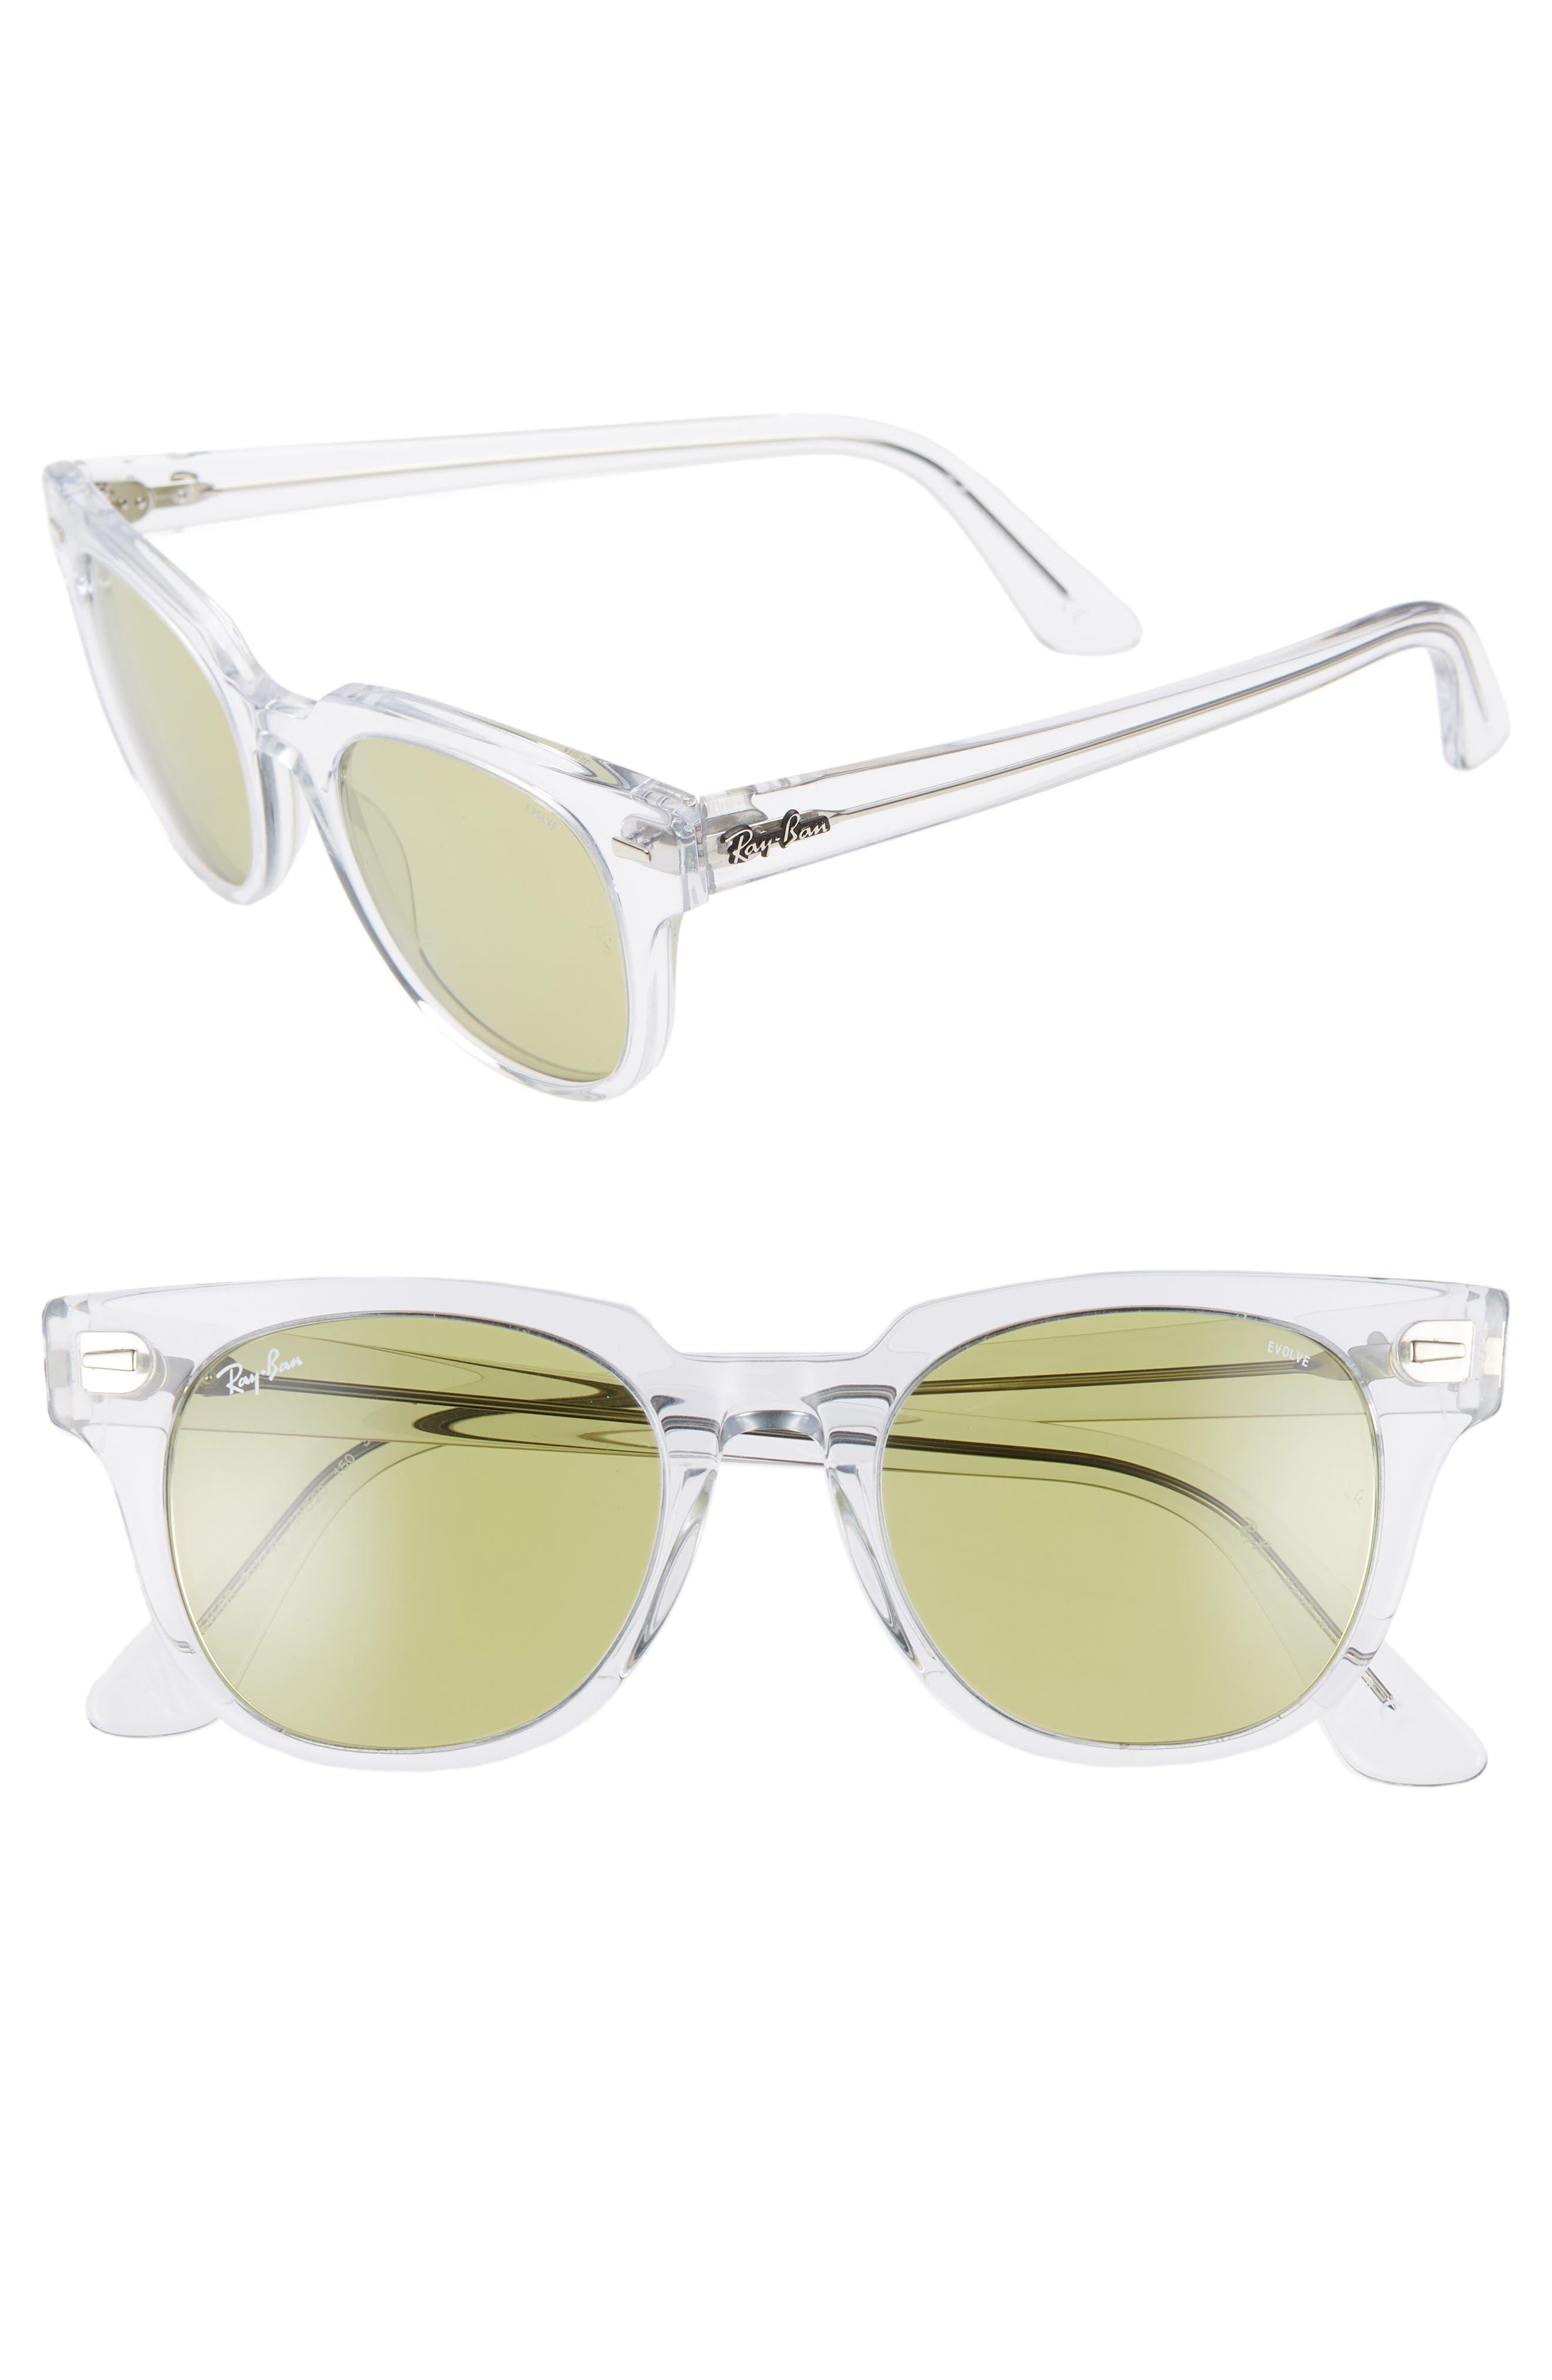 Ray-Ban Meteor 50Mm Wayfarer Photochromic Sunglasses - Crystal/ Green Solid